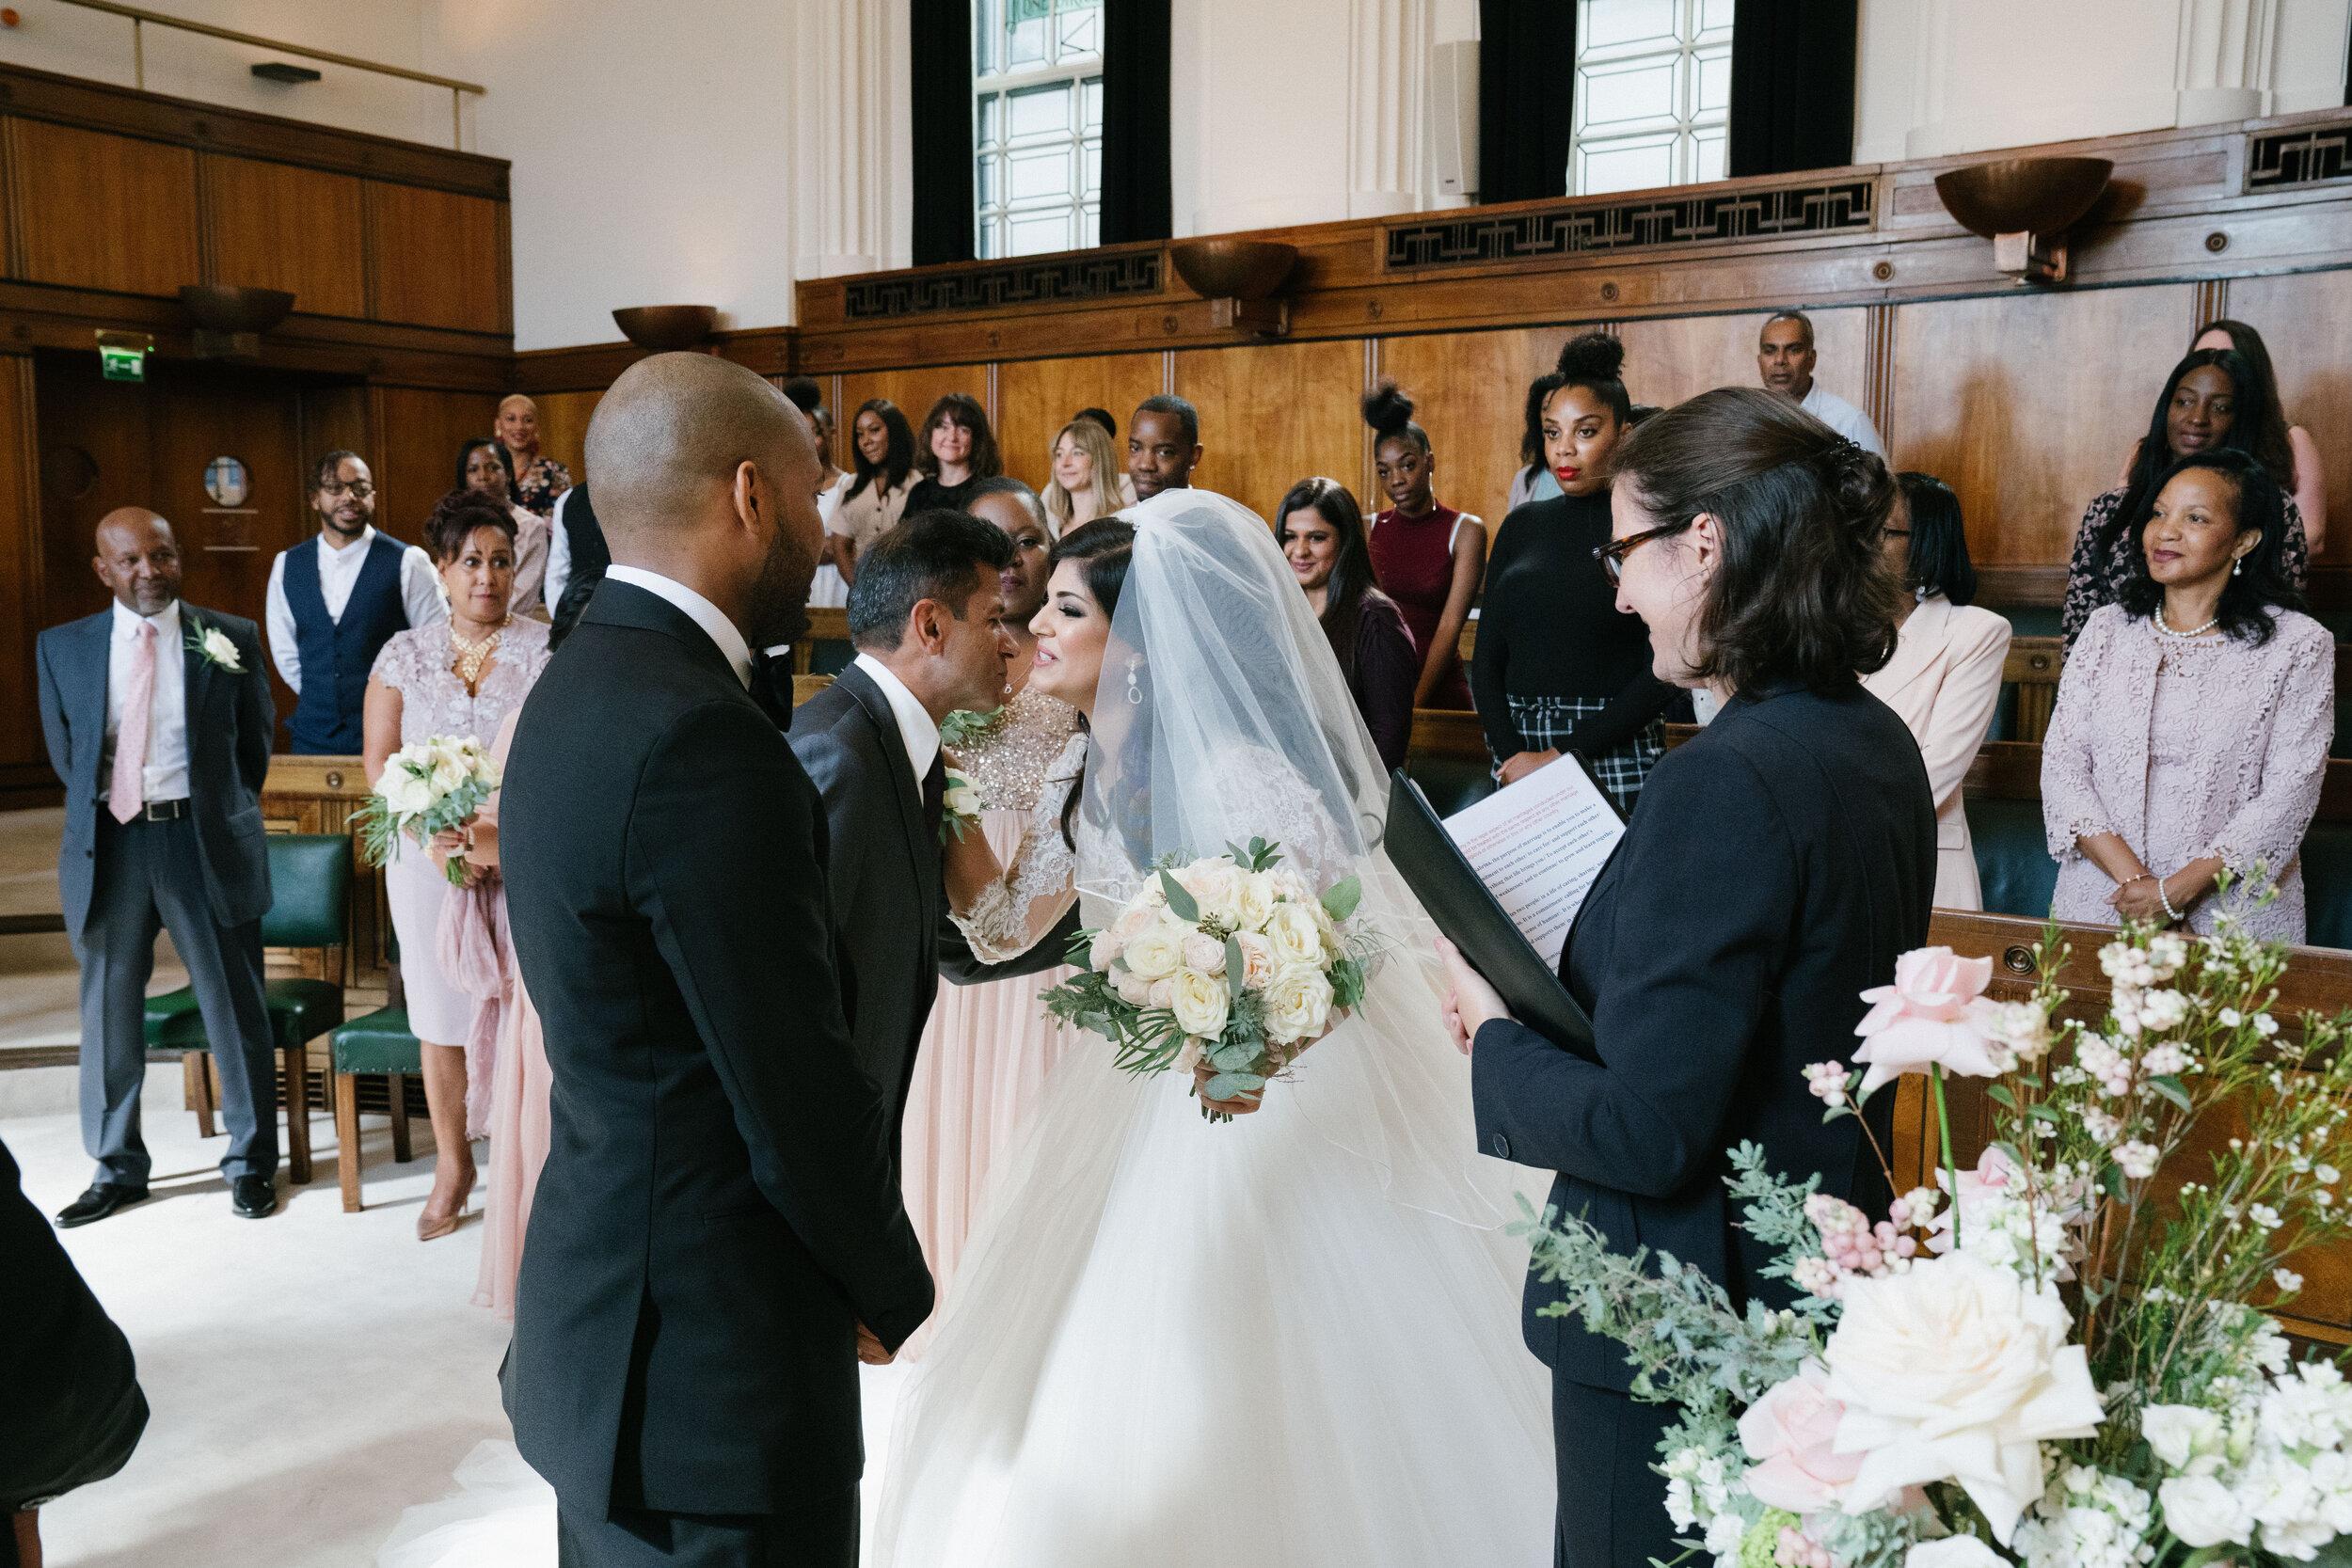 east-london-wedding-photographer-videographer-patriot-square-apartments-31